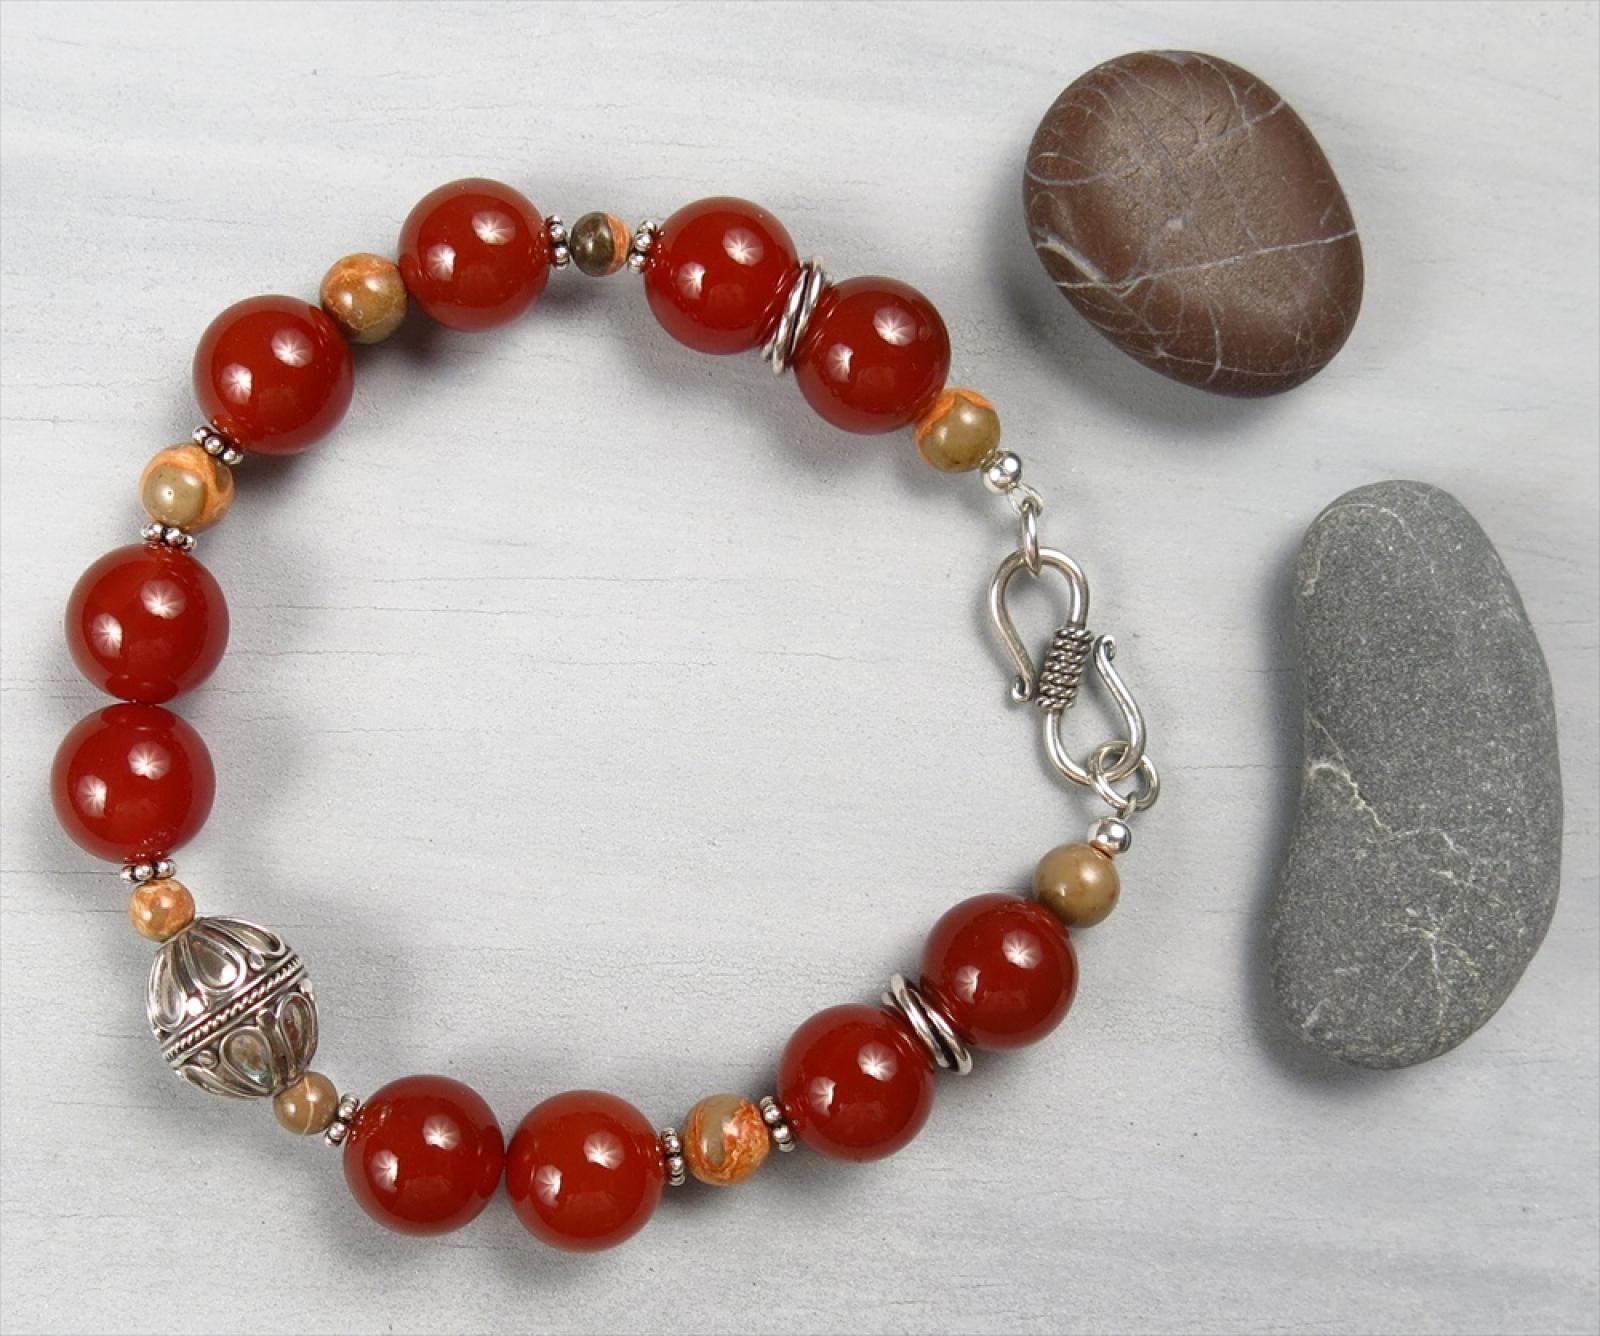 Handmade Carnelian And Bali Silver Bracelet Handmade Jewelry